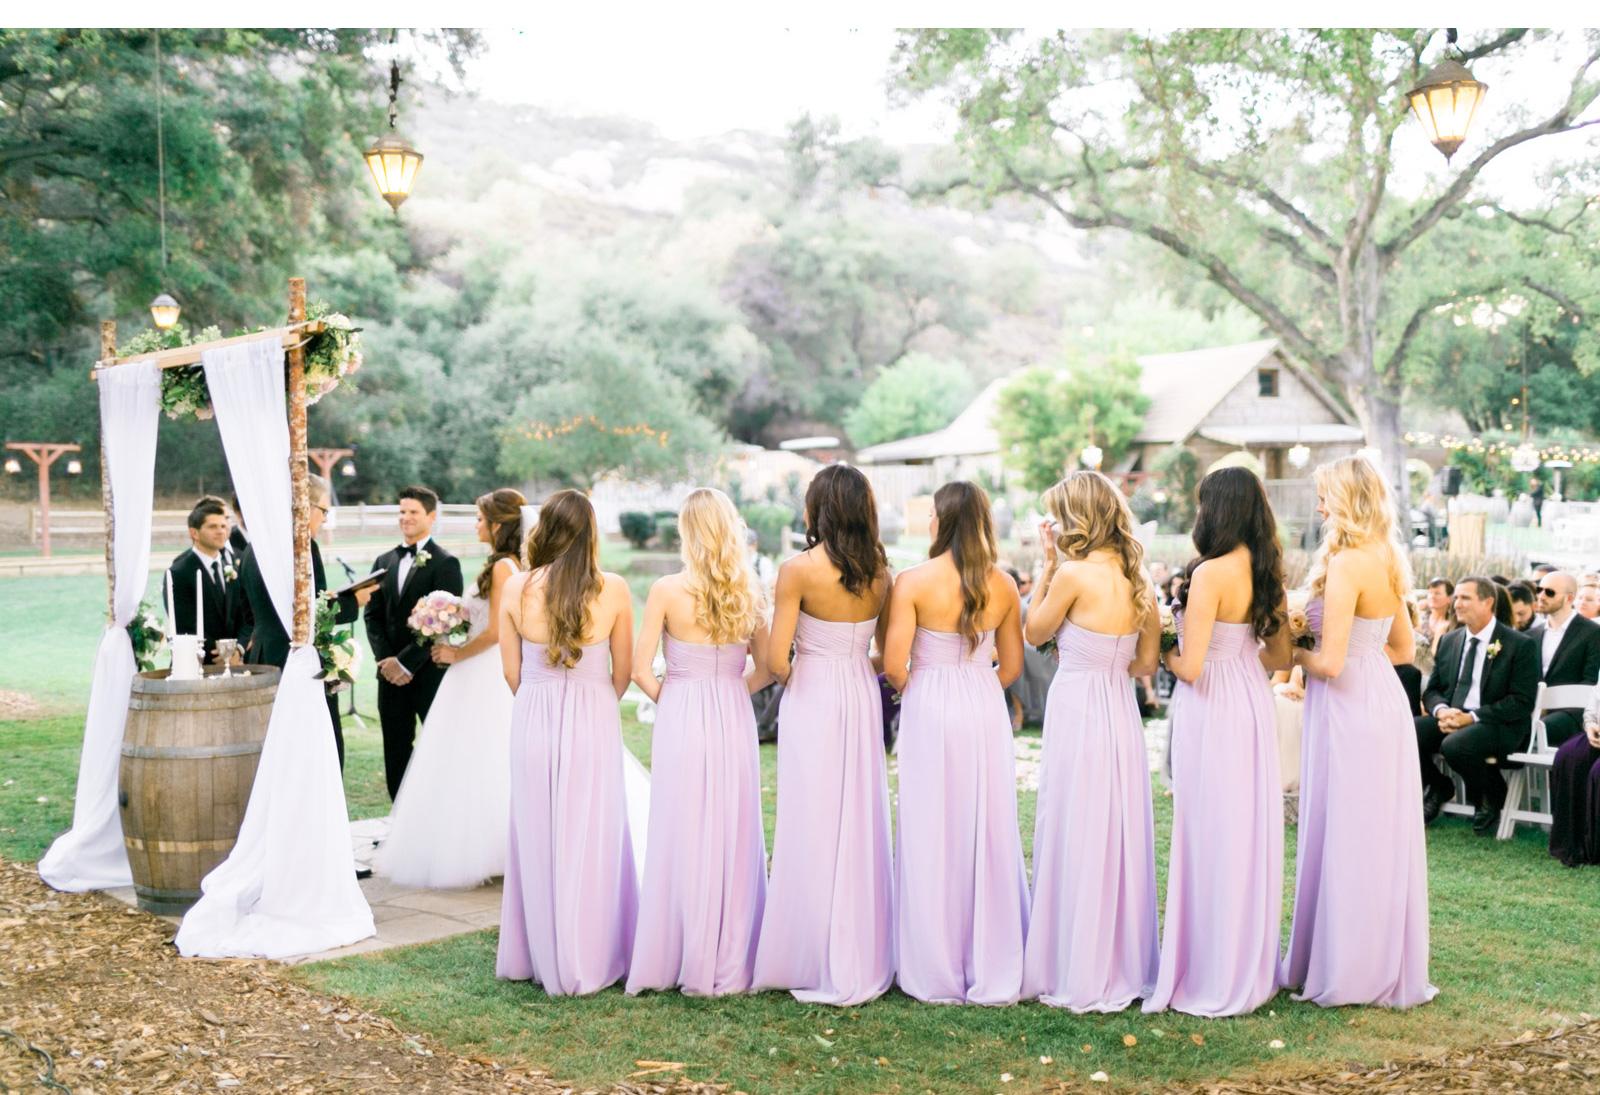 Nia-Sanchez-Miss-USA-Temecula-Wedding-Natalie-Schutt-Photography_02.jpg